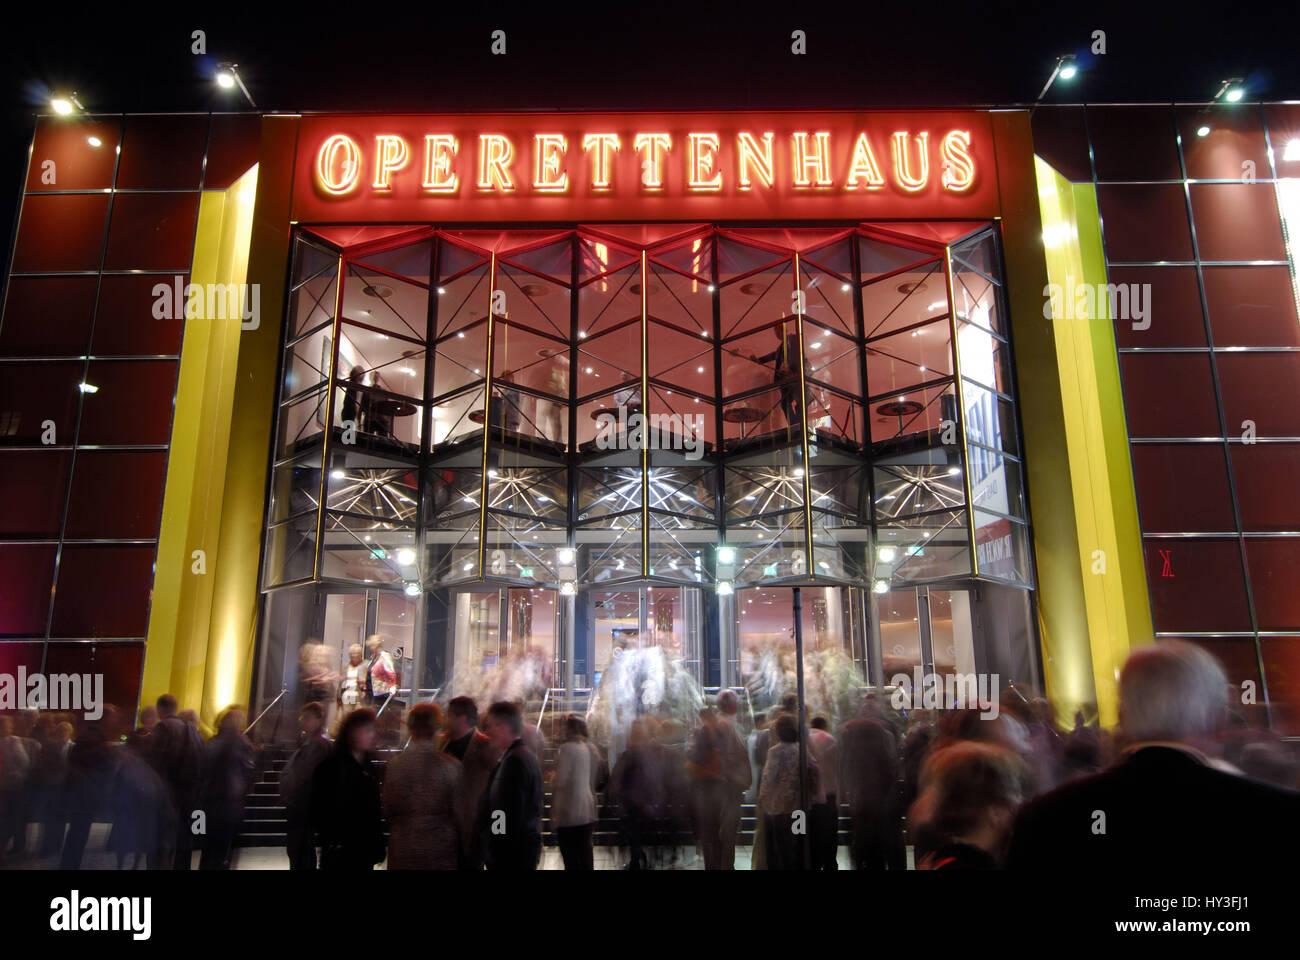 Germany, Hamburg, Saint Pauli, hamburger, town, Gro? town, evening, in the evening, building, lights up, illuminated, lighting, meadow? enansicht, ope Stock Photo